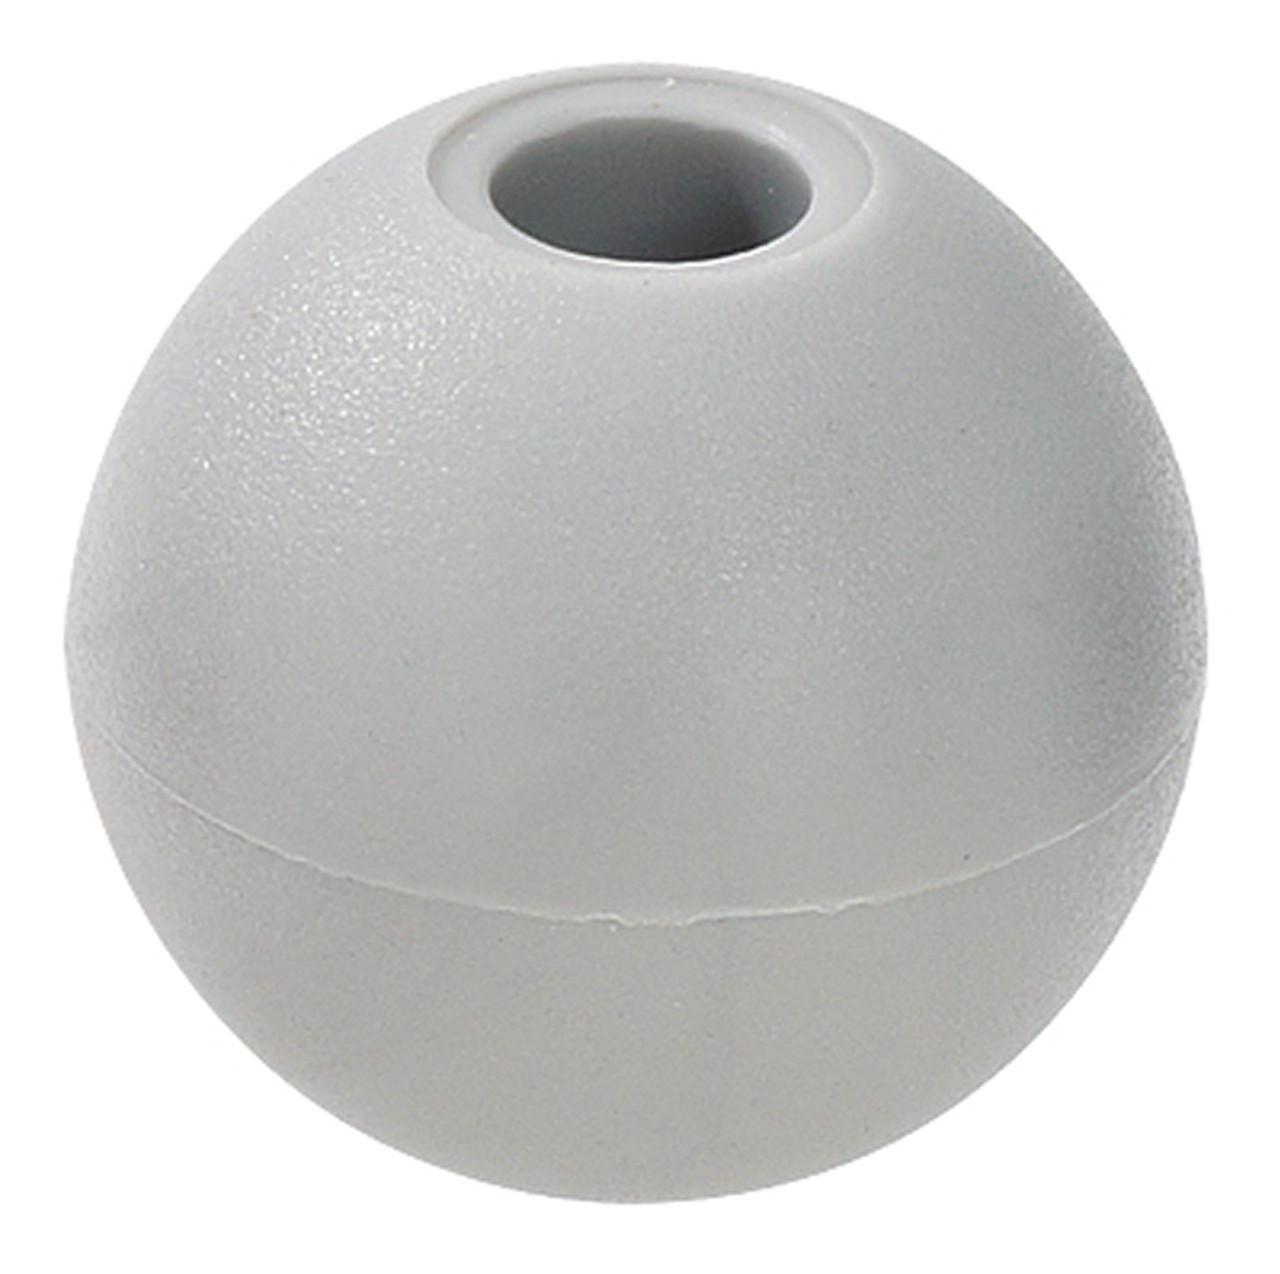 "Silver 1"" Nylon Beaded Retainer Ring Balls"